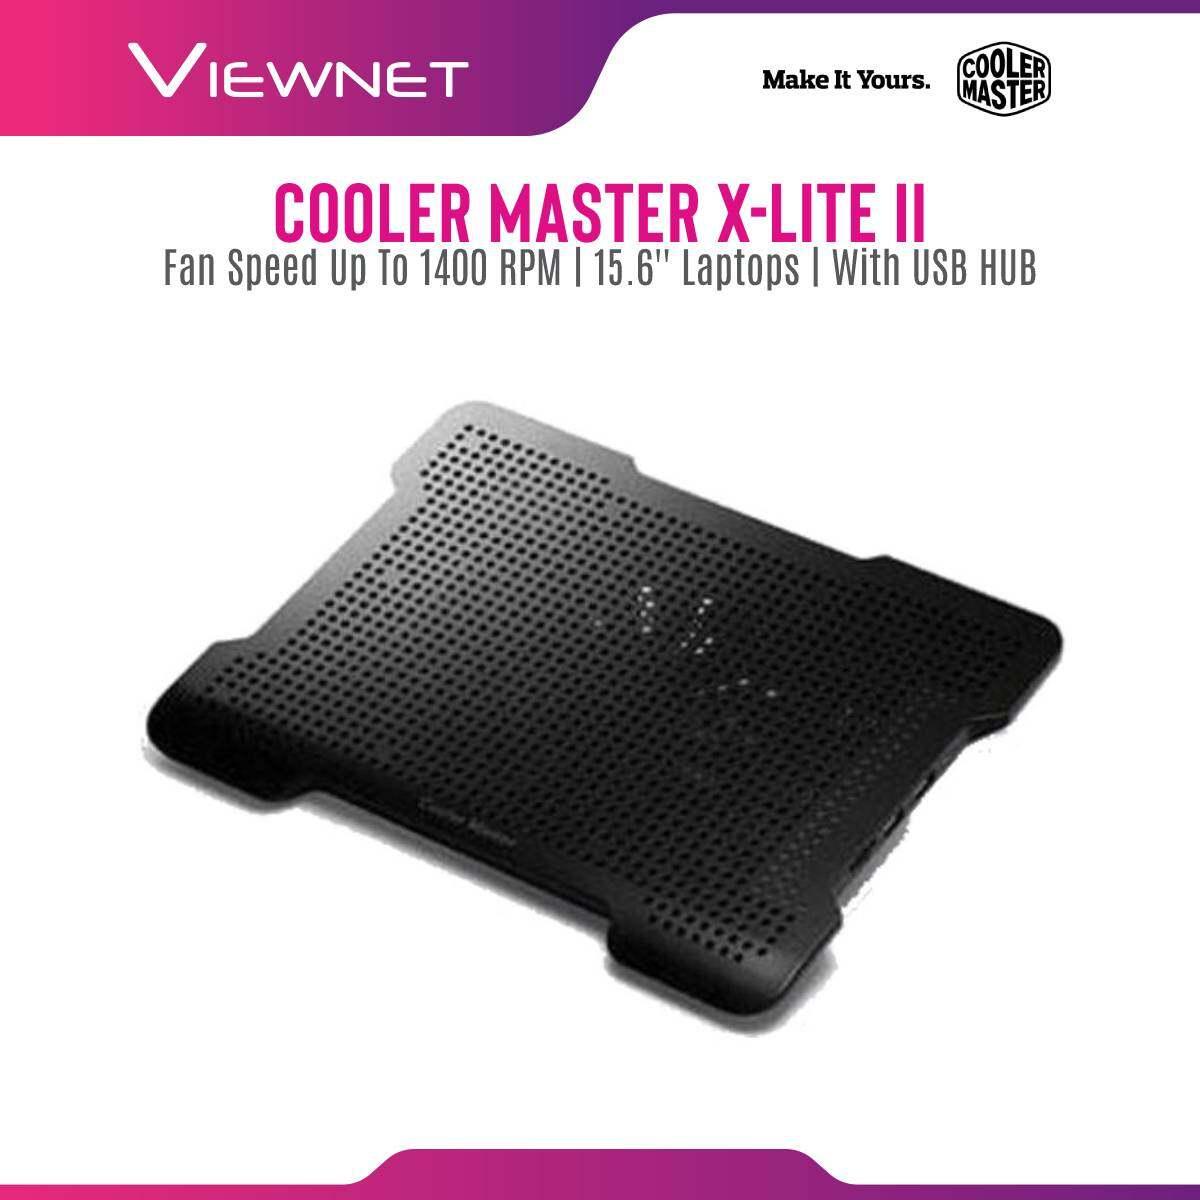 Cooler Master X-LITE II Notepal, Silent 140mm fan, Ergonomic design, Ultra slim, 2 USB outputs, Fan Speed Controller, Elegant metal plate, Cooling Pad